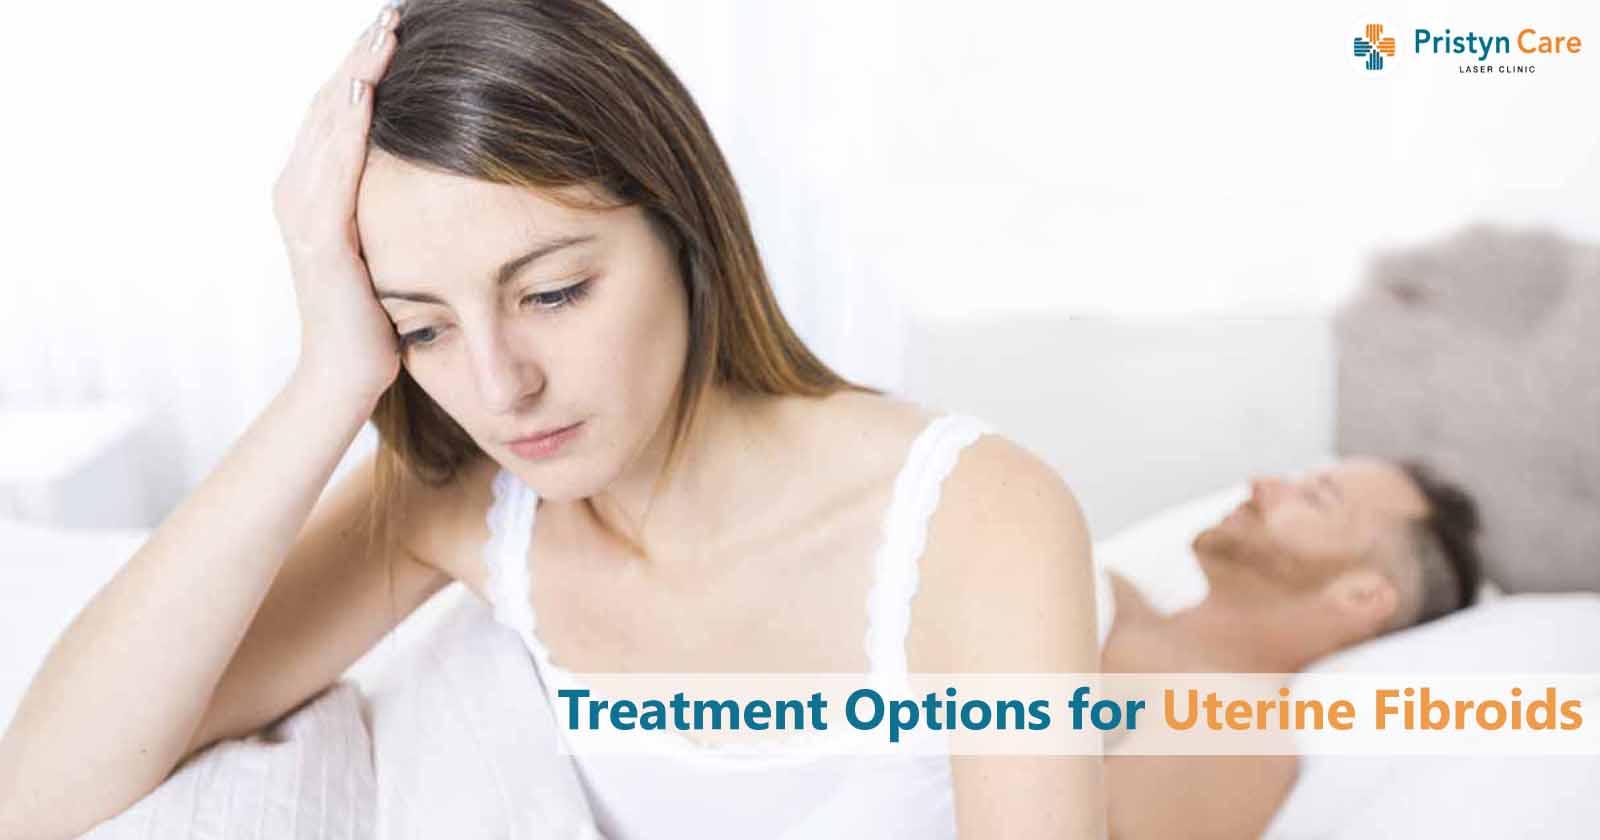 Treatment Options for Uterine Fibroids